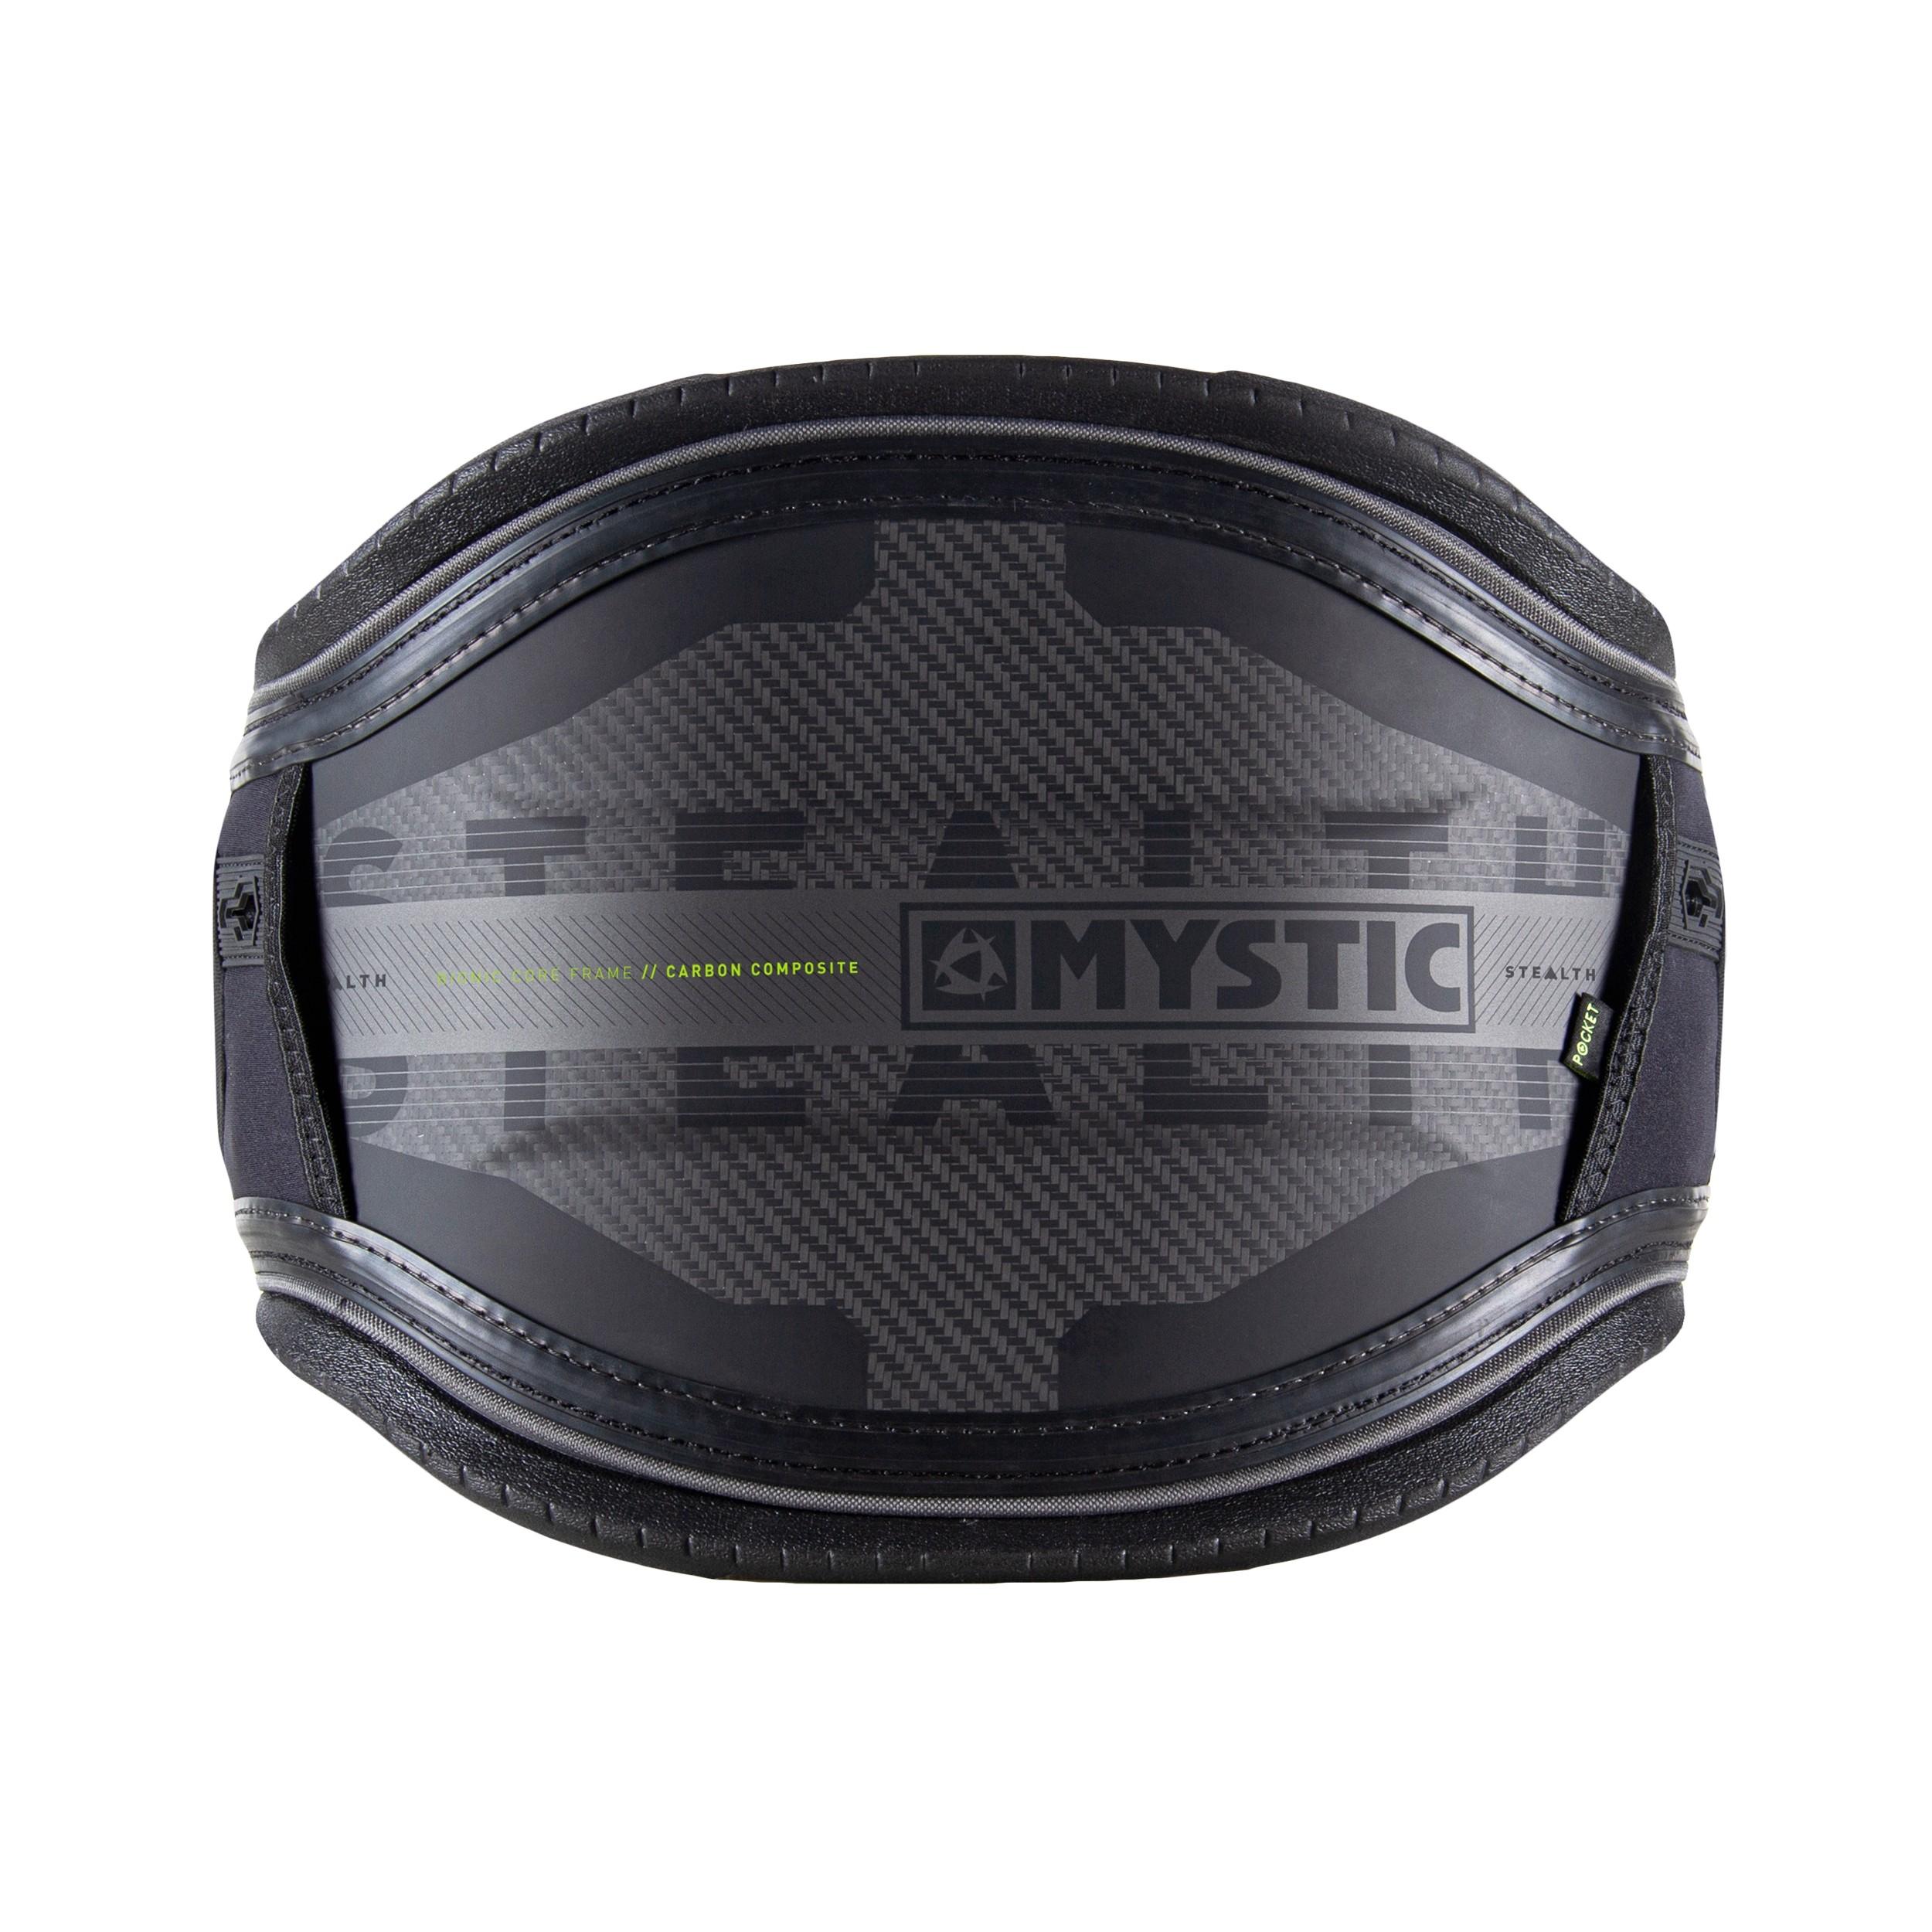 Mystic Stealth Kitesurf Harness